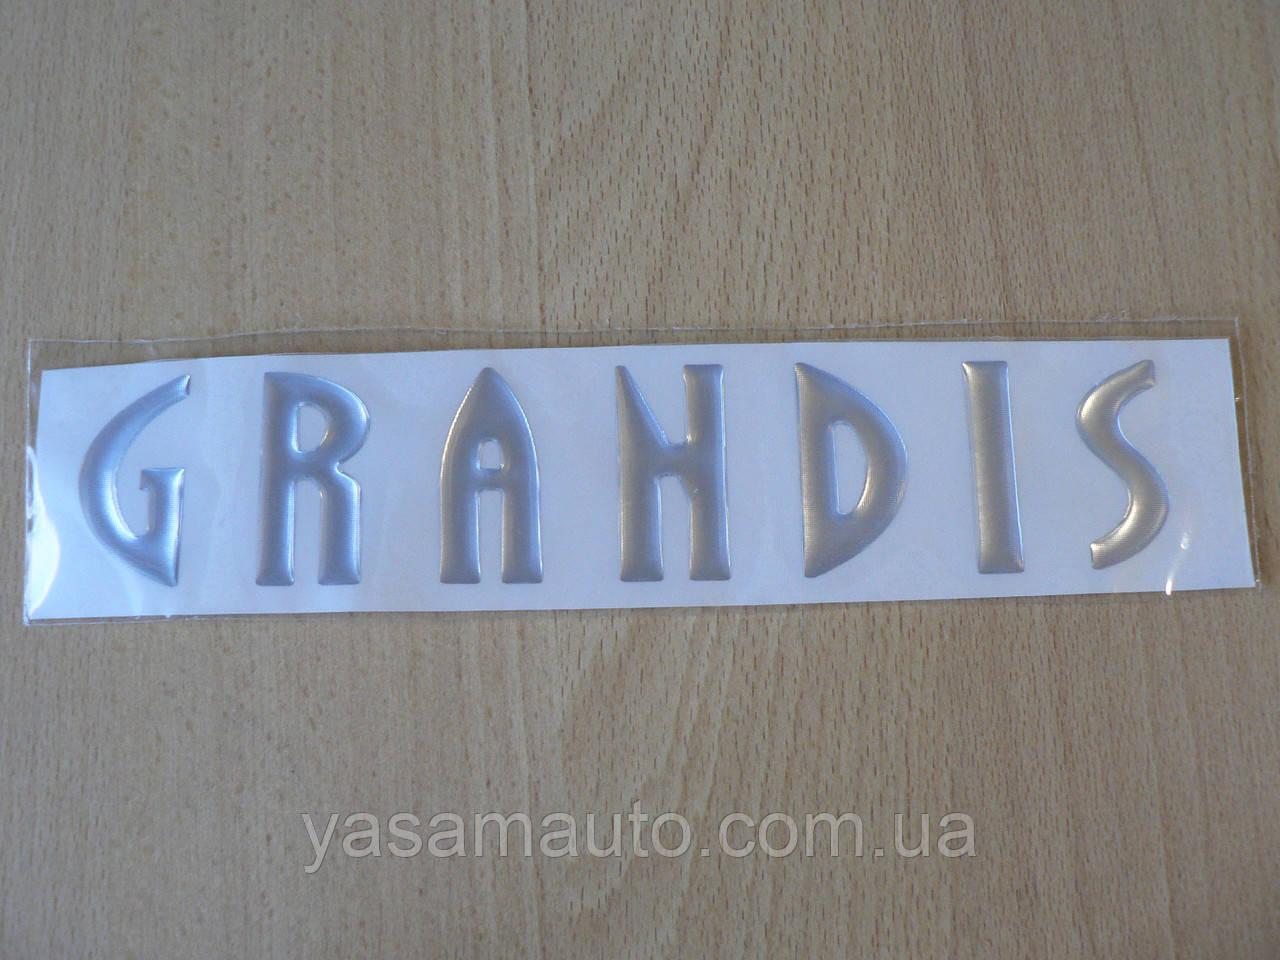 Наклейка s орнамент задний GRANDIS 203х40мм серебрист силиконовая надпись на авто Mitsubishi Митсубиши Грандис